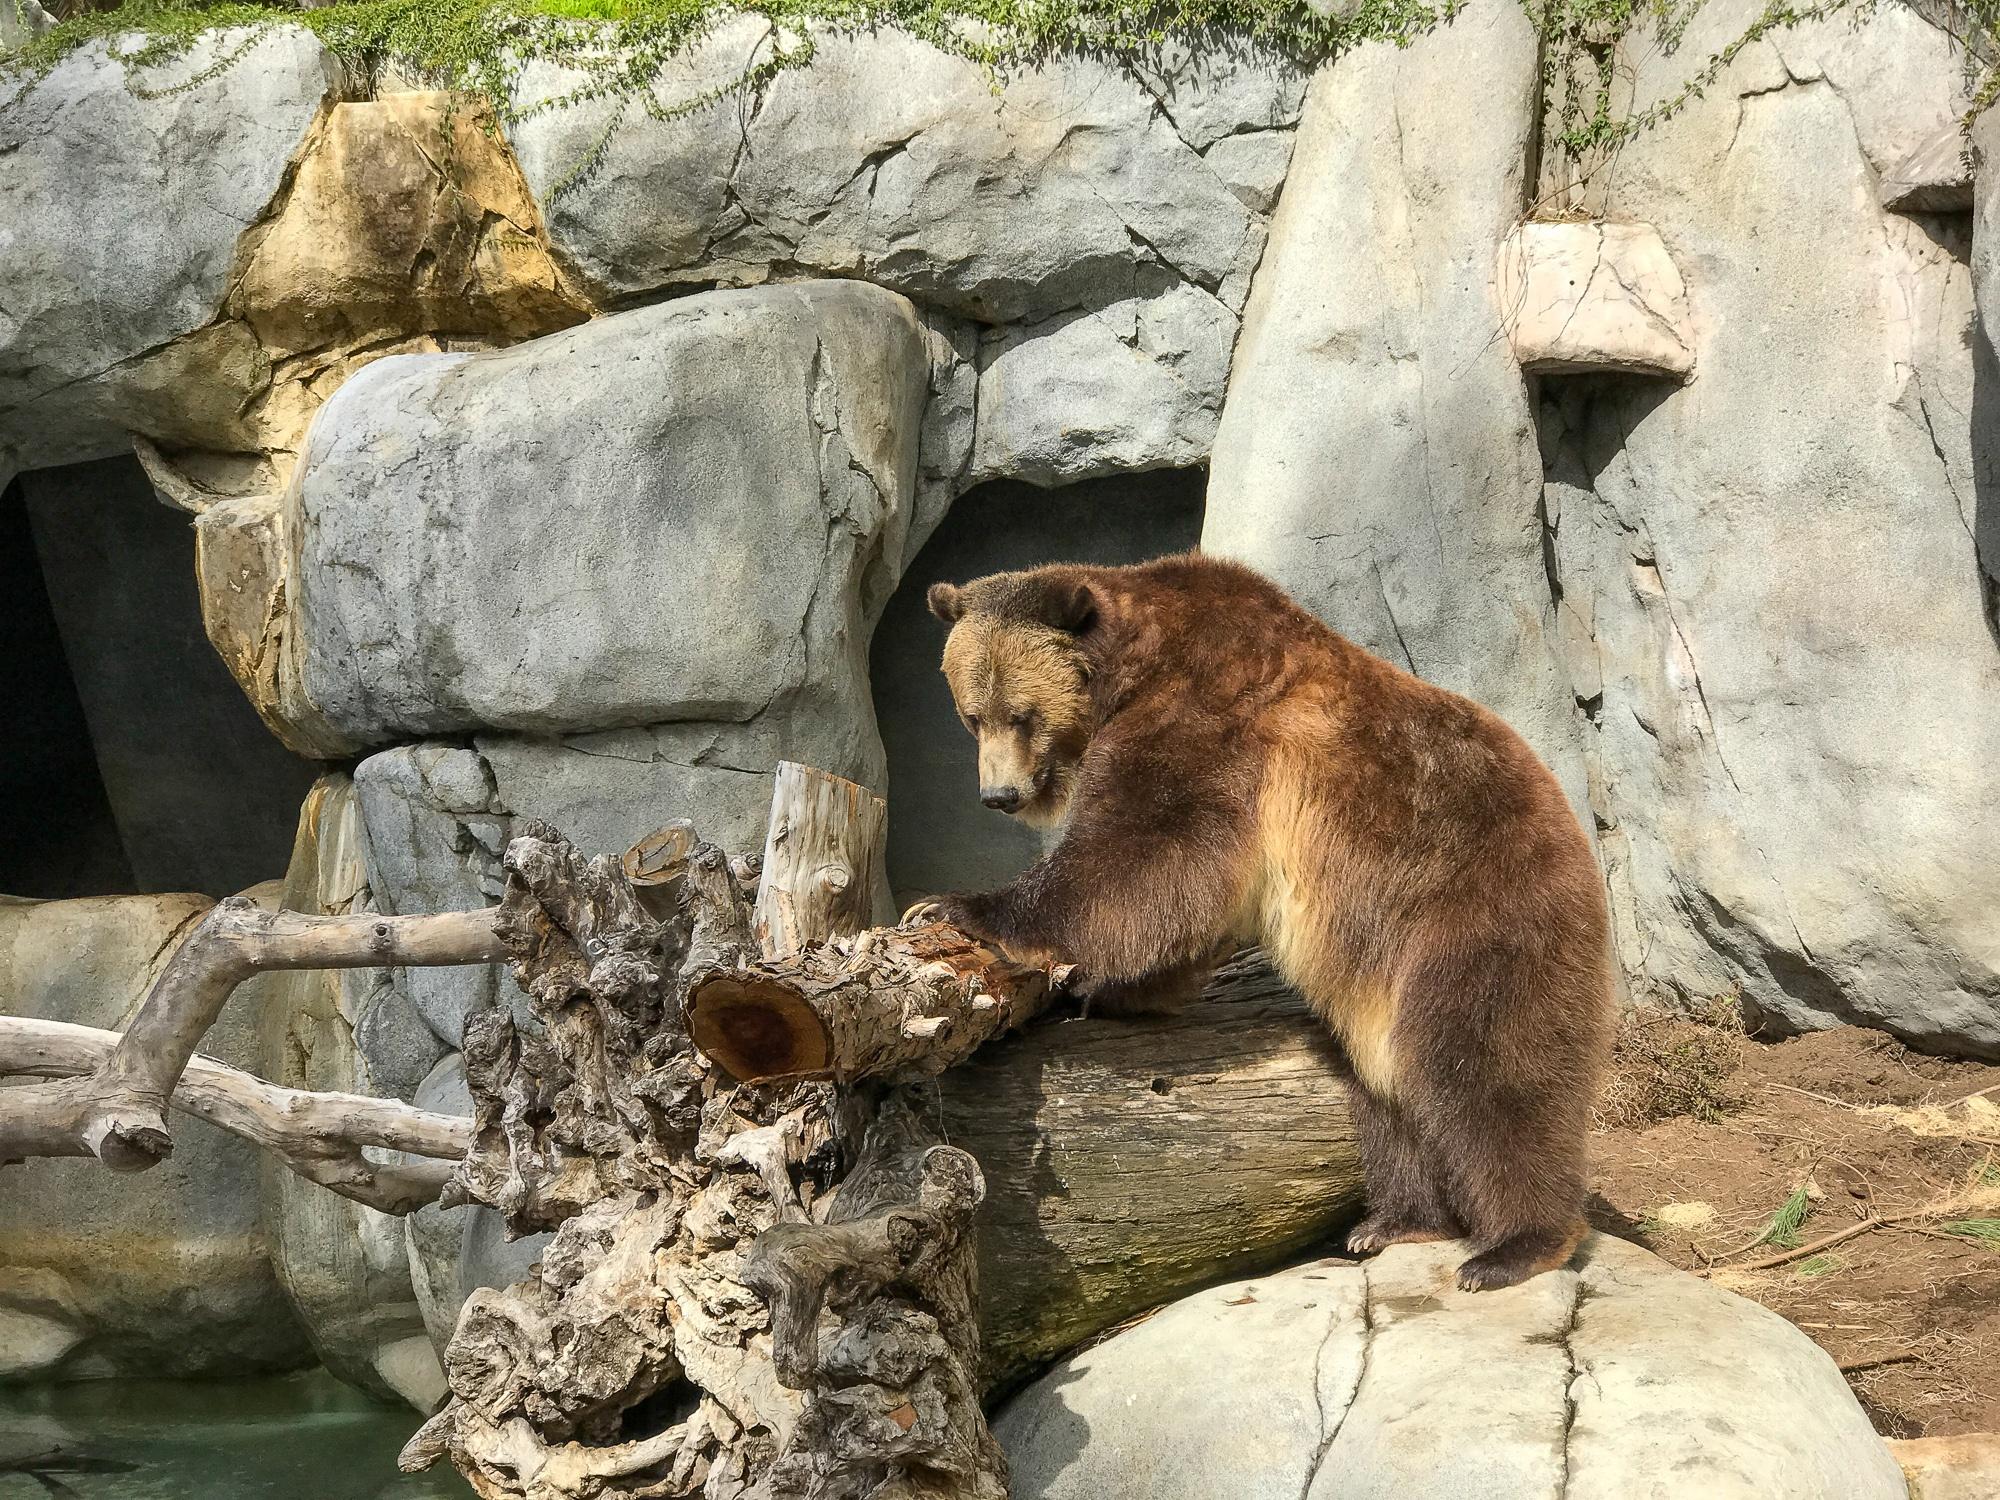 San Diego Zoo bear